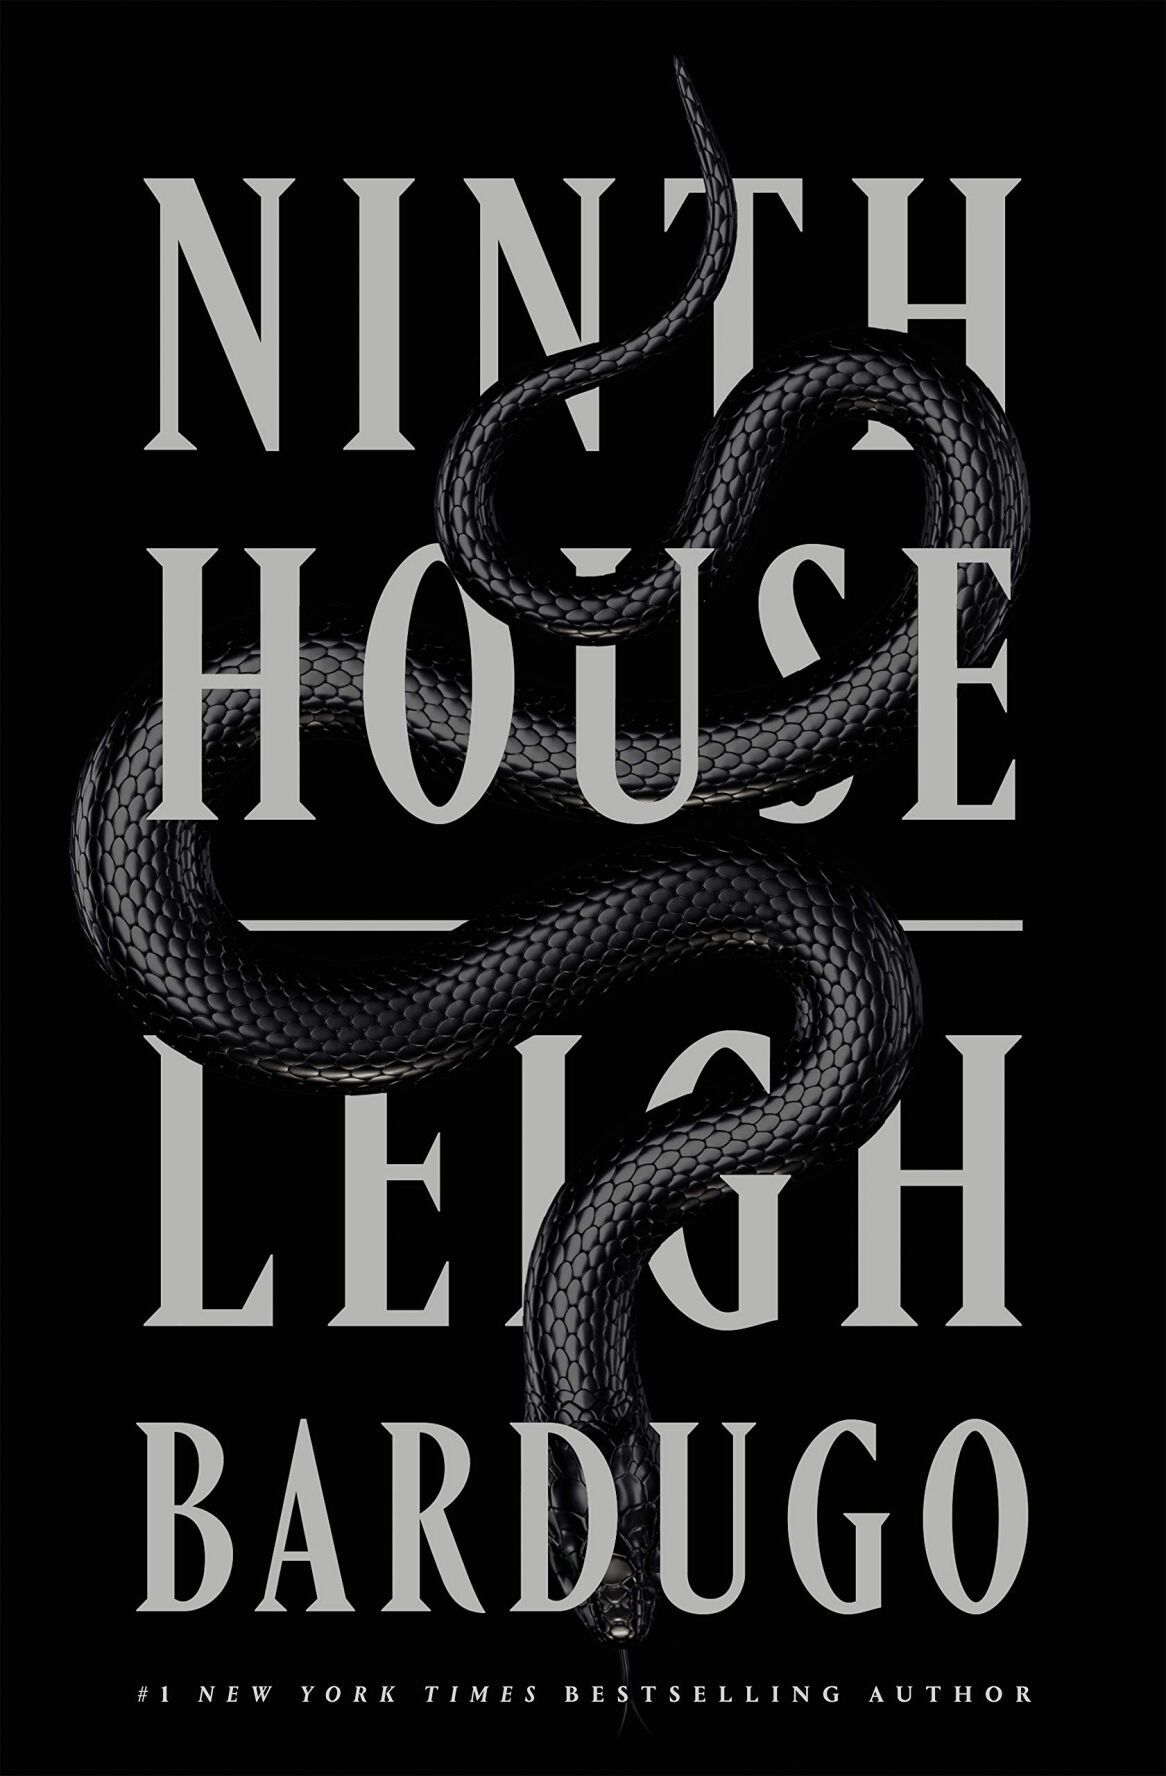 NinthHouse.jpg